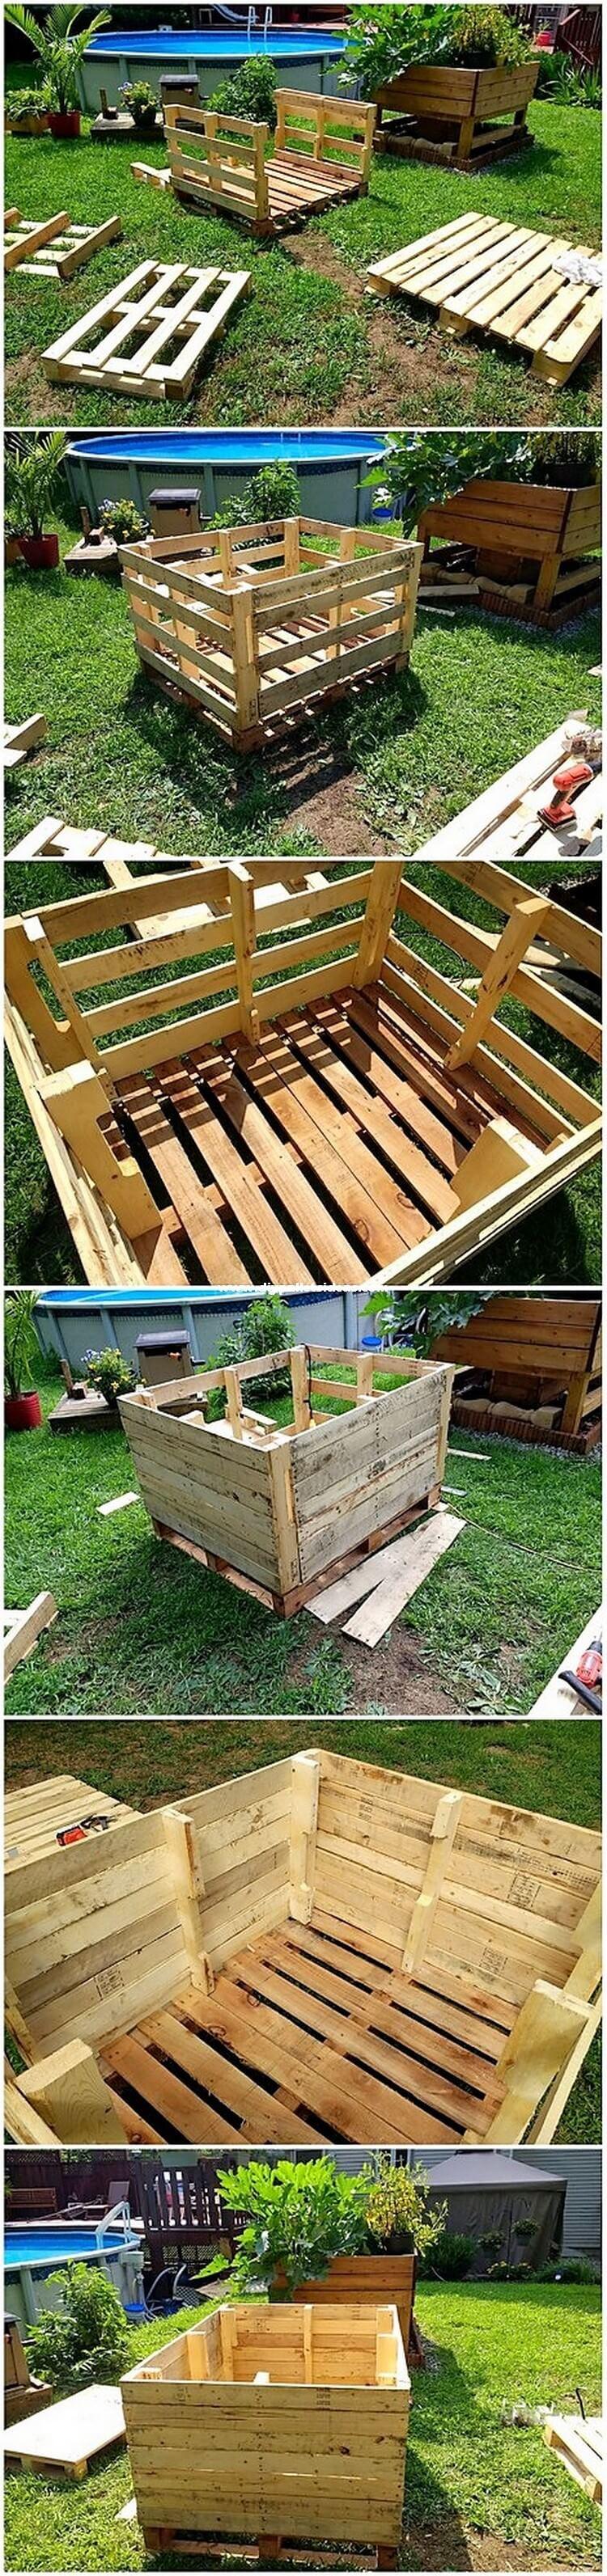 DIY Pallet Planter